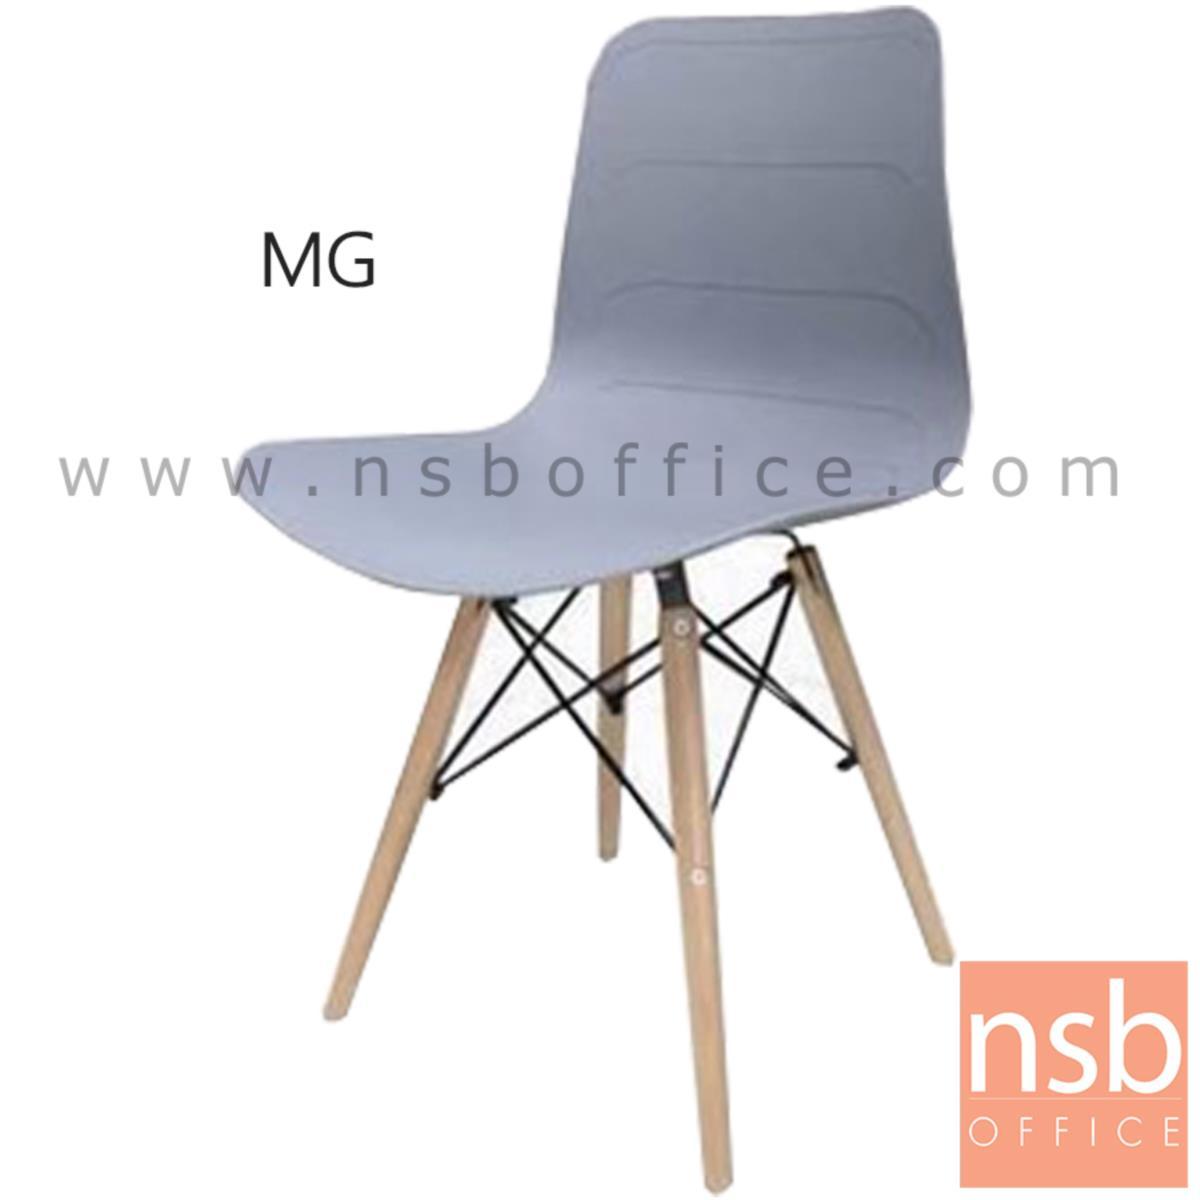 B29A333:เก้าอี้โมเดิร์น รุ่น FOX (ฟอกซ์) ขนาด 45W cm. ขาไม้